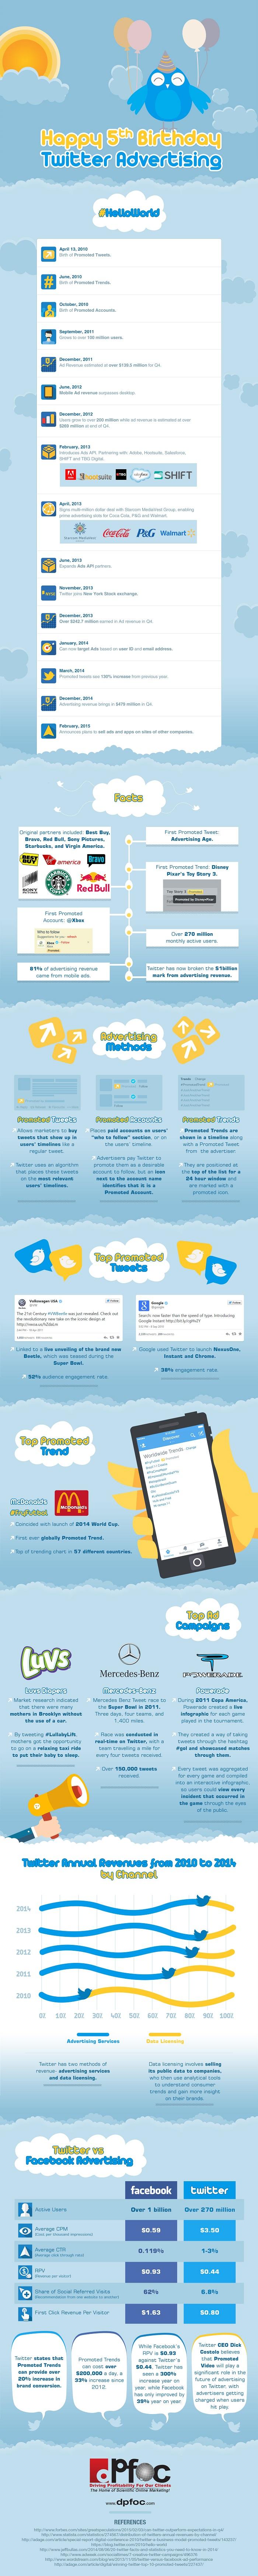 Happy Birthday Twitter Advertising